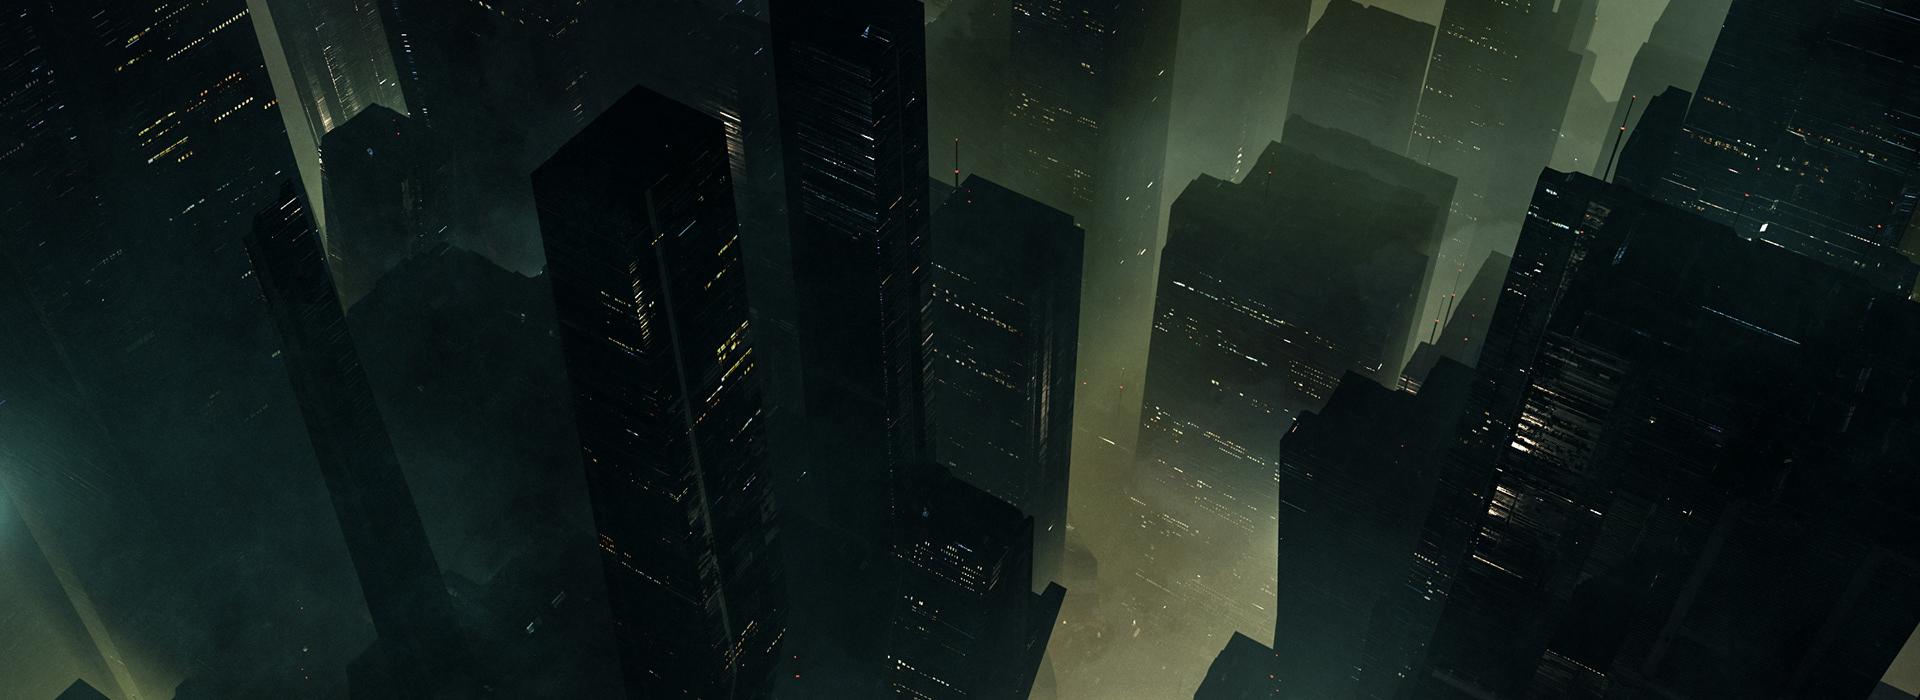 Megacity / Nightscape